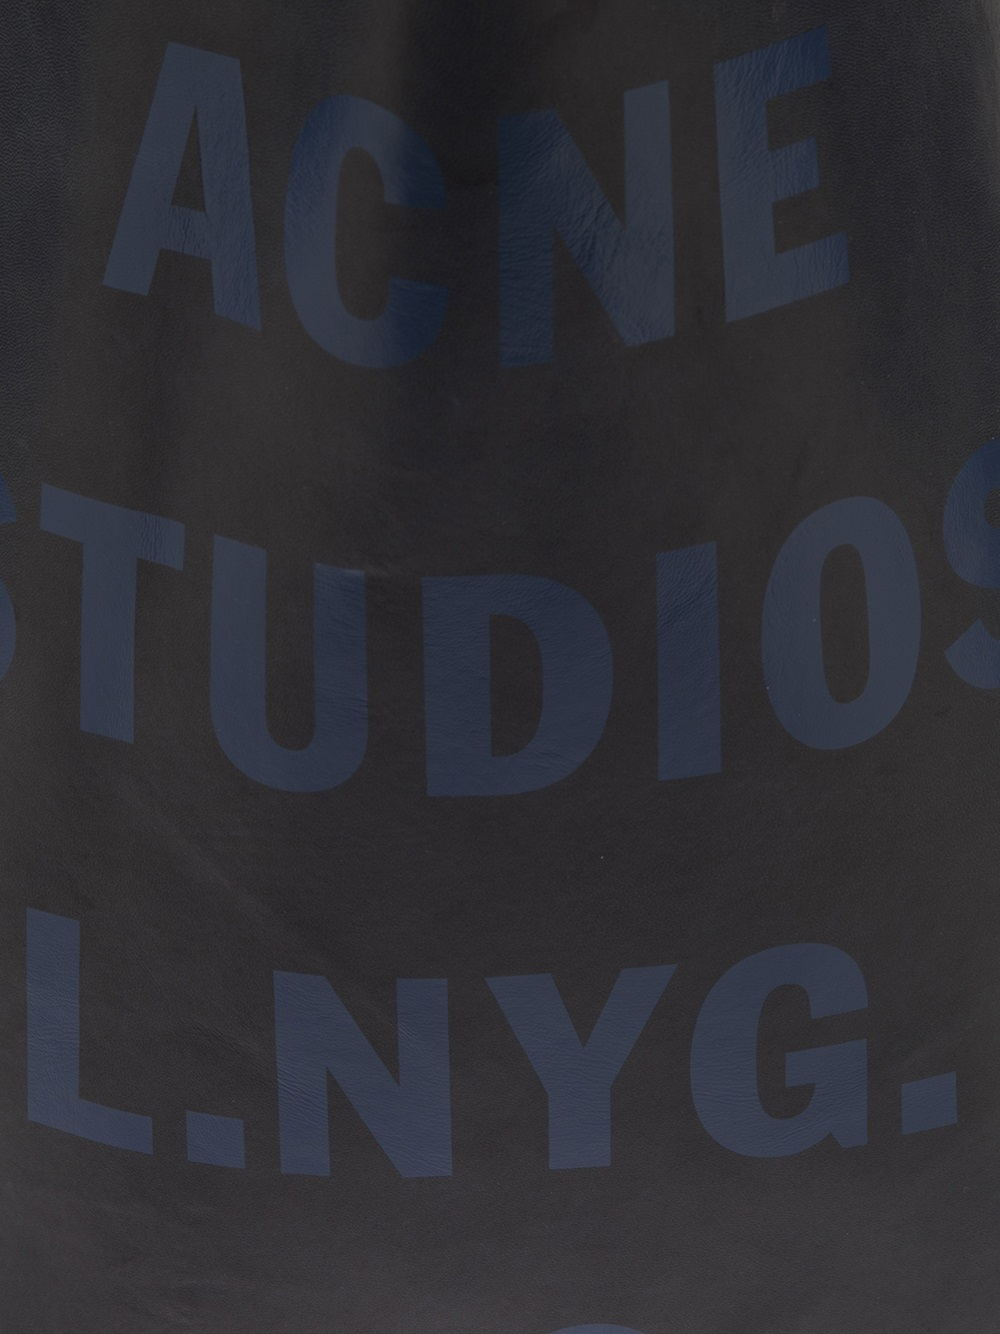 Acne Studios Rumor Us Tote in Blue (Grey)